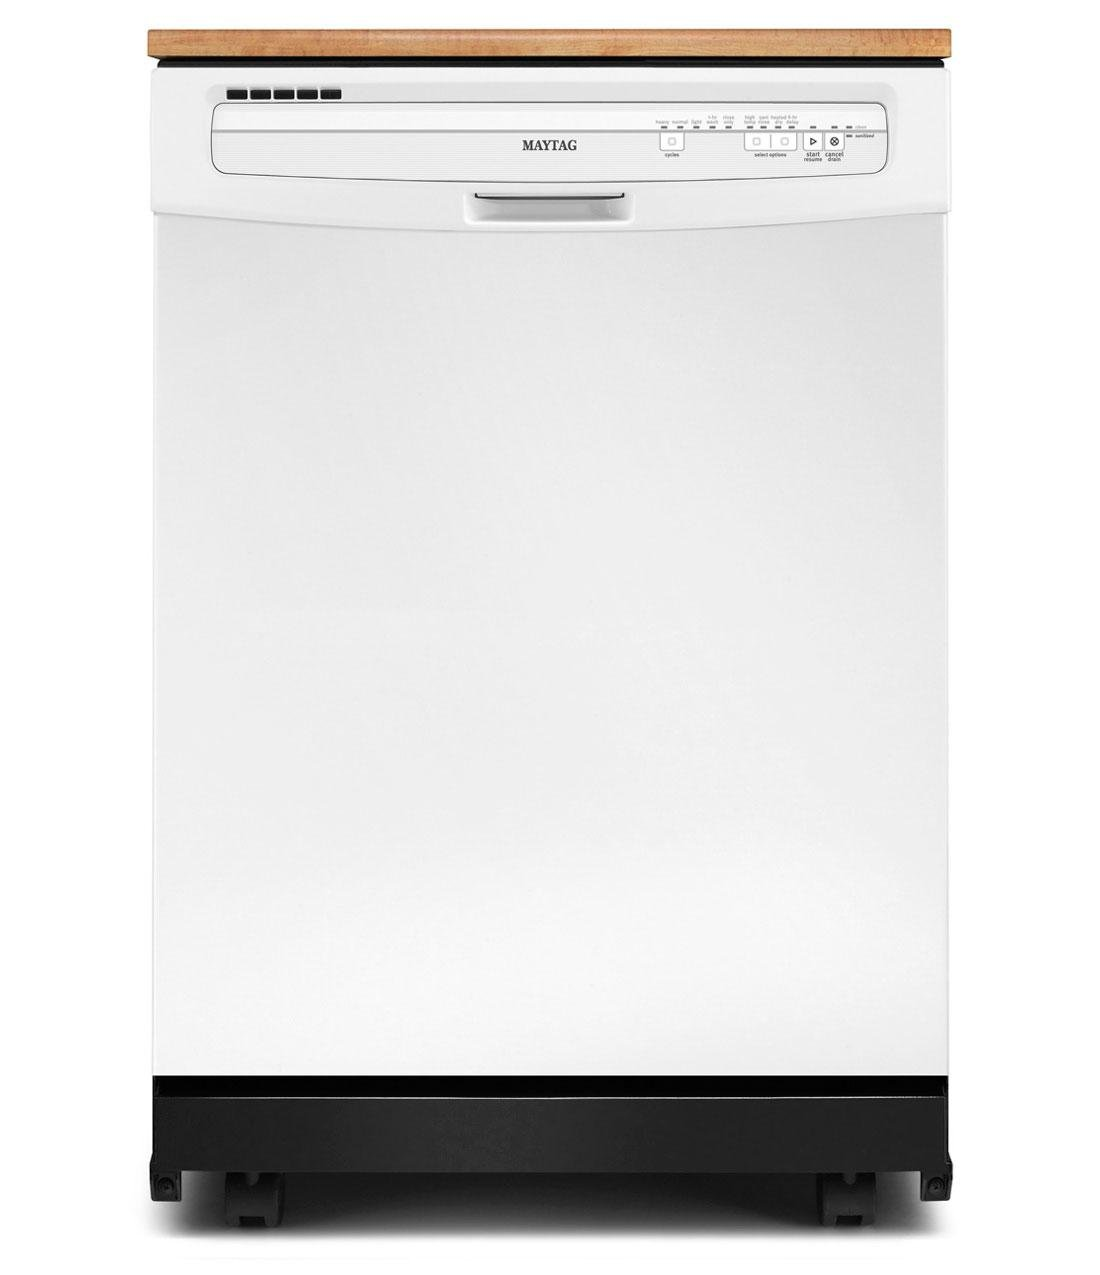 Maytag MDC4809PAW JetClean Portable Full Console Dishwasher